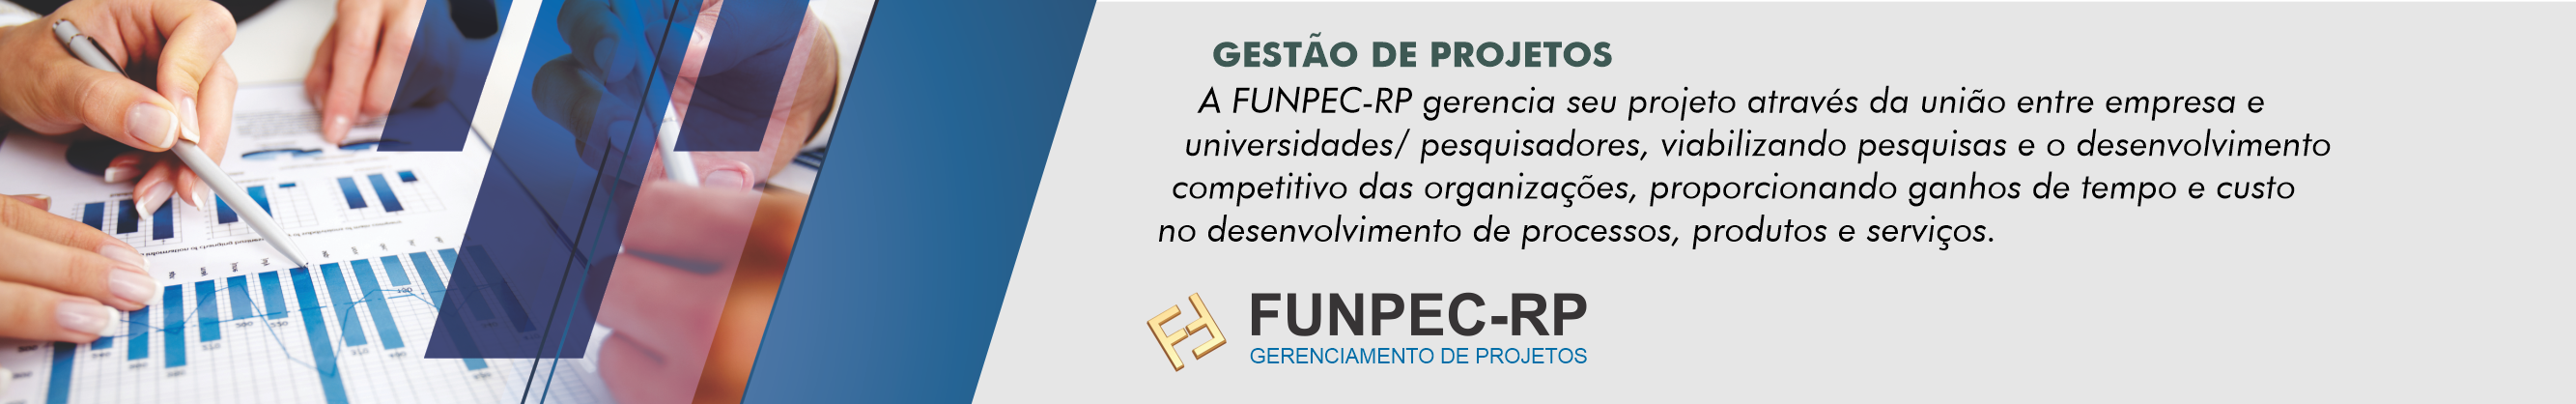 banner_Projetos